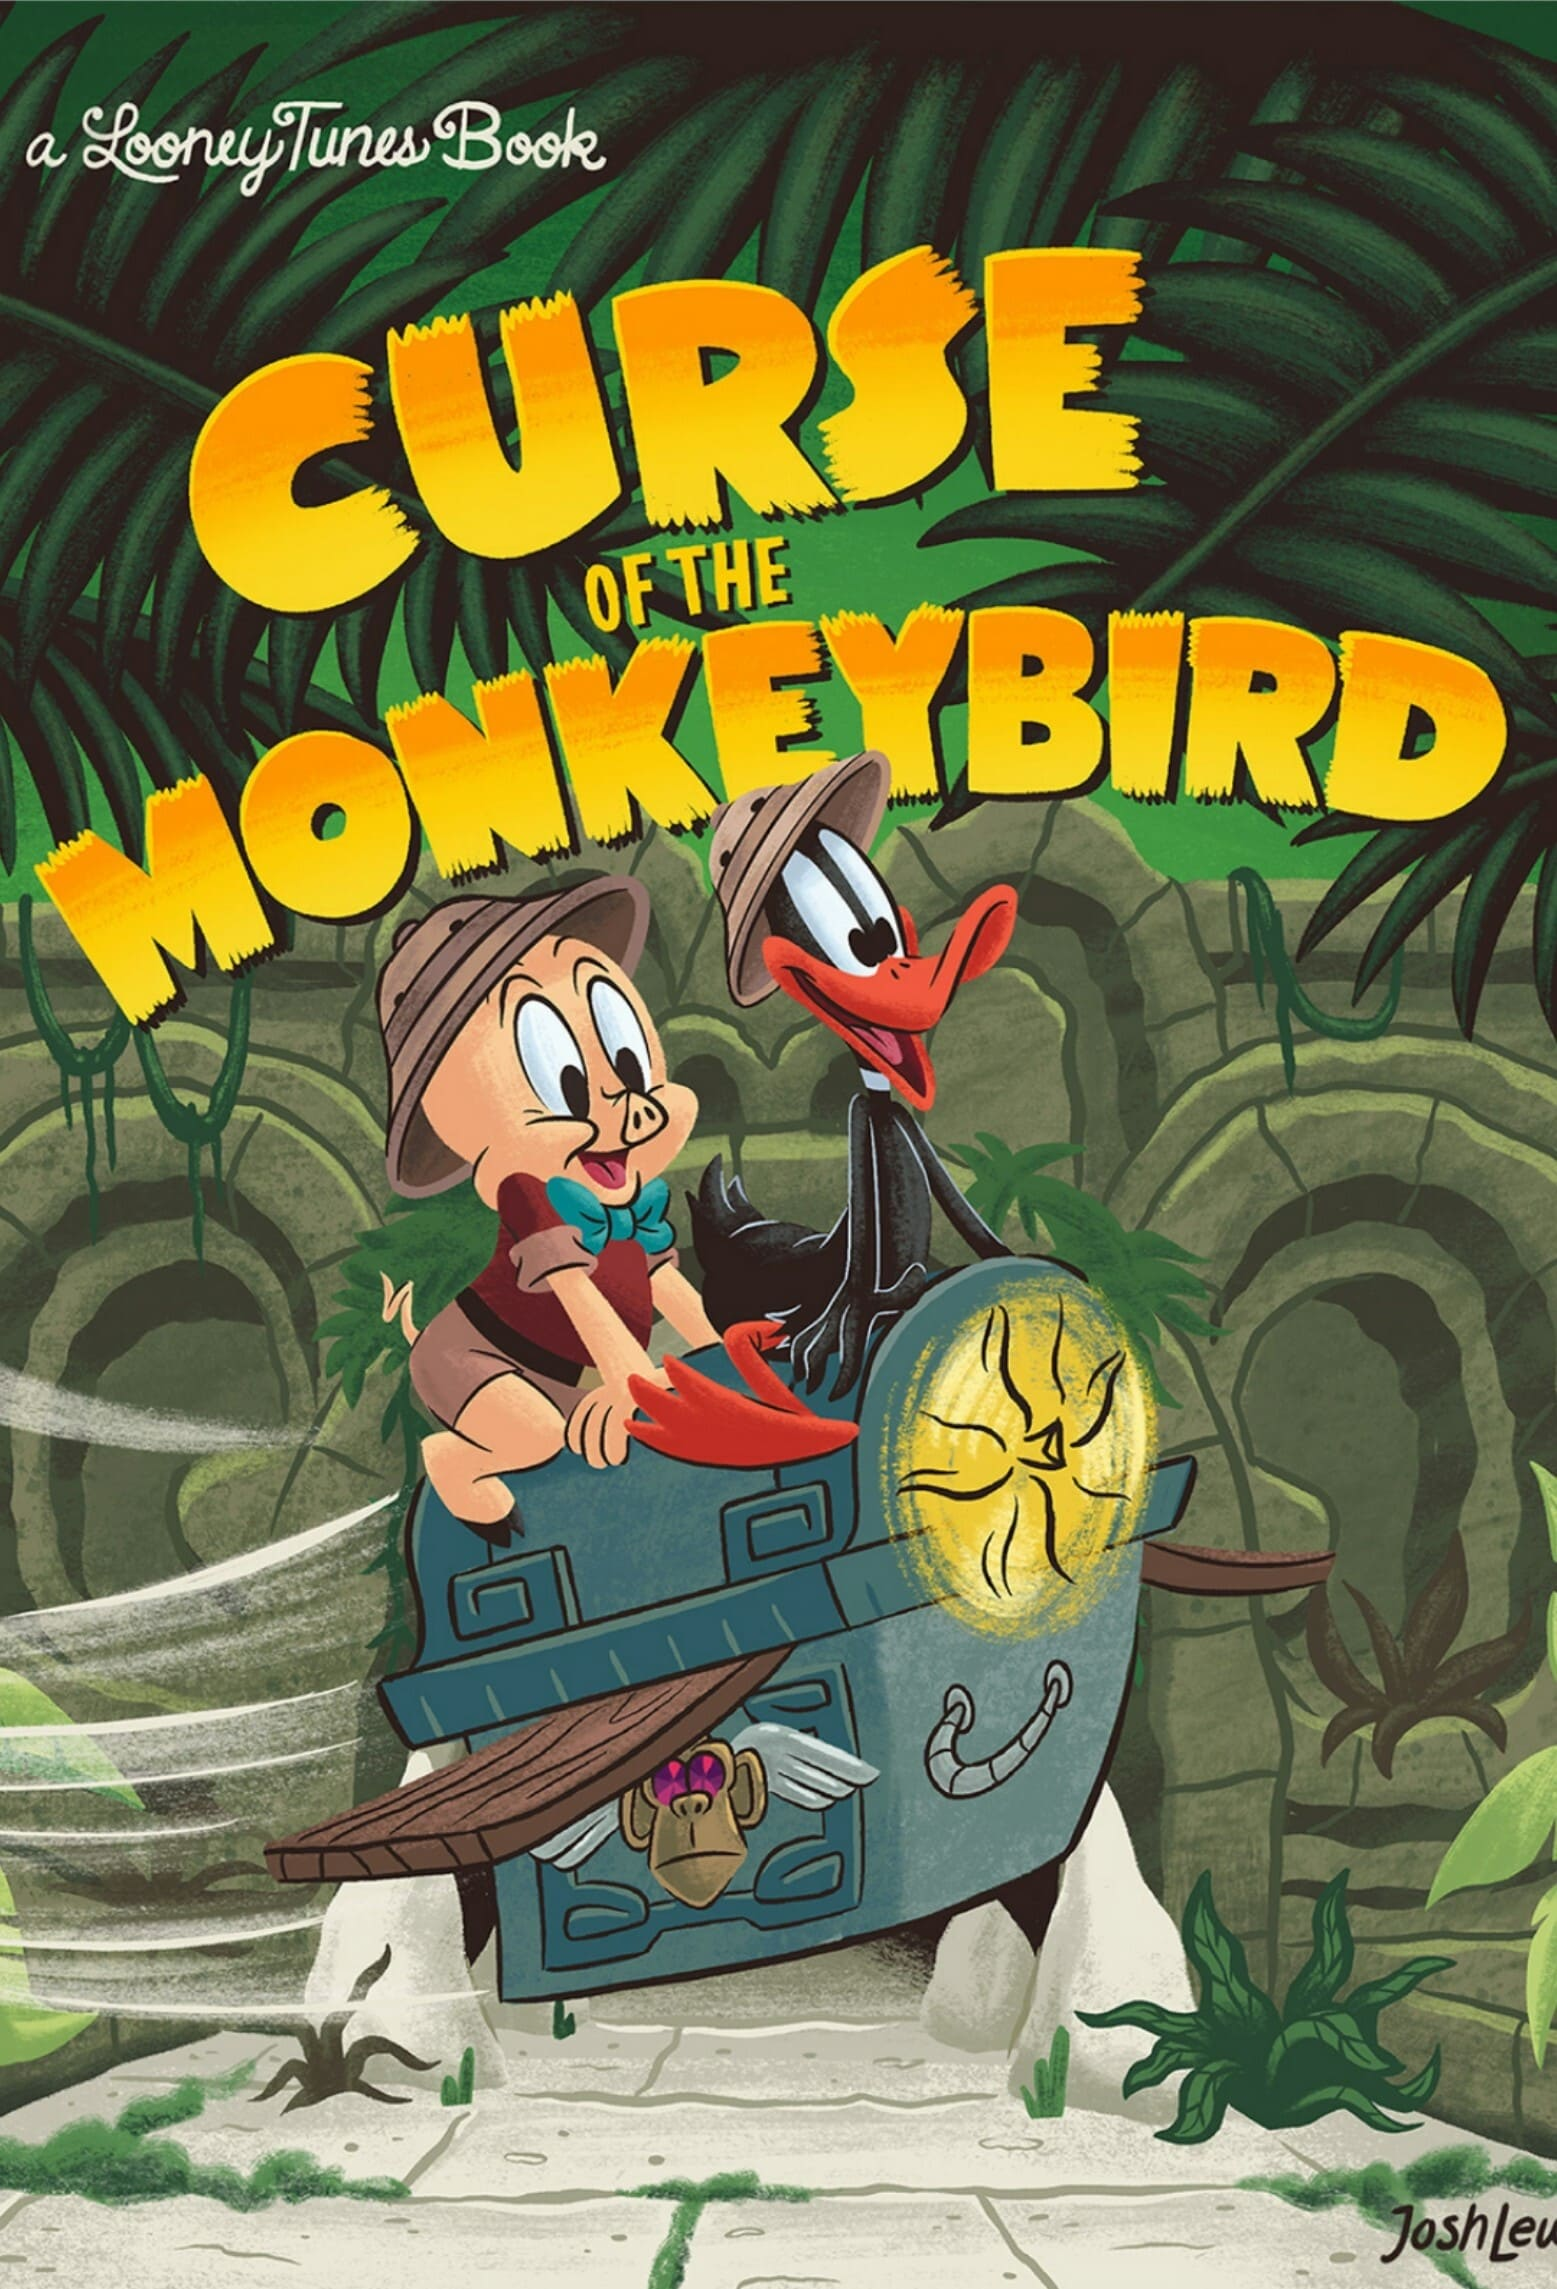 The Curse of the Monkey Bird (2019)